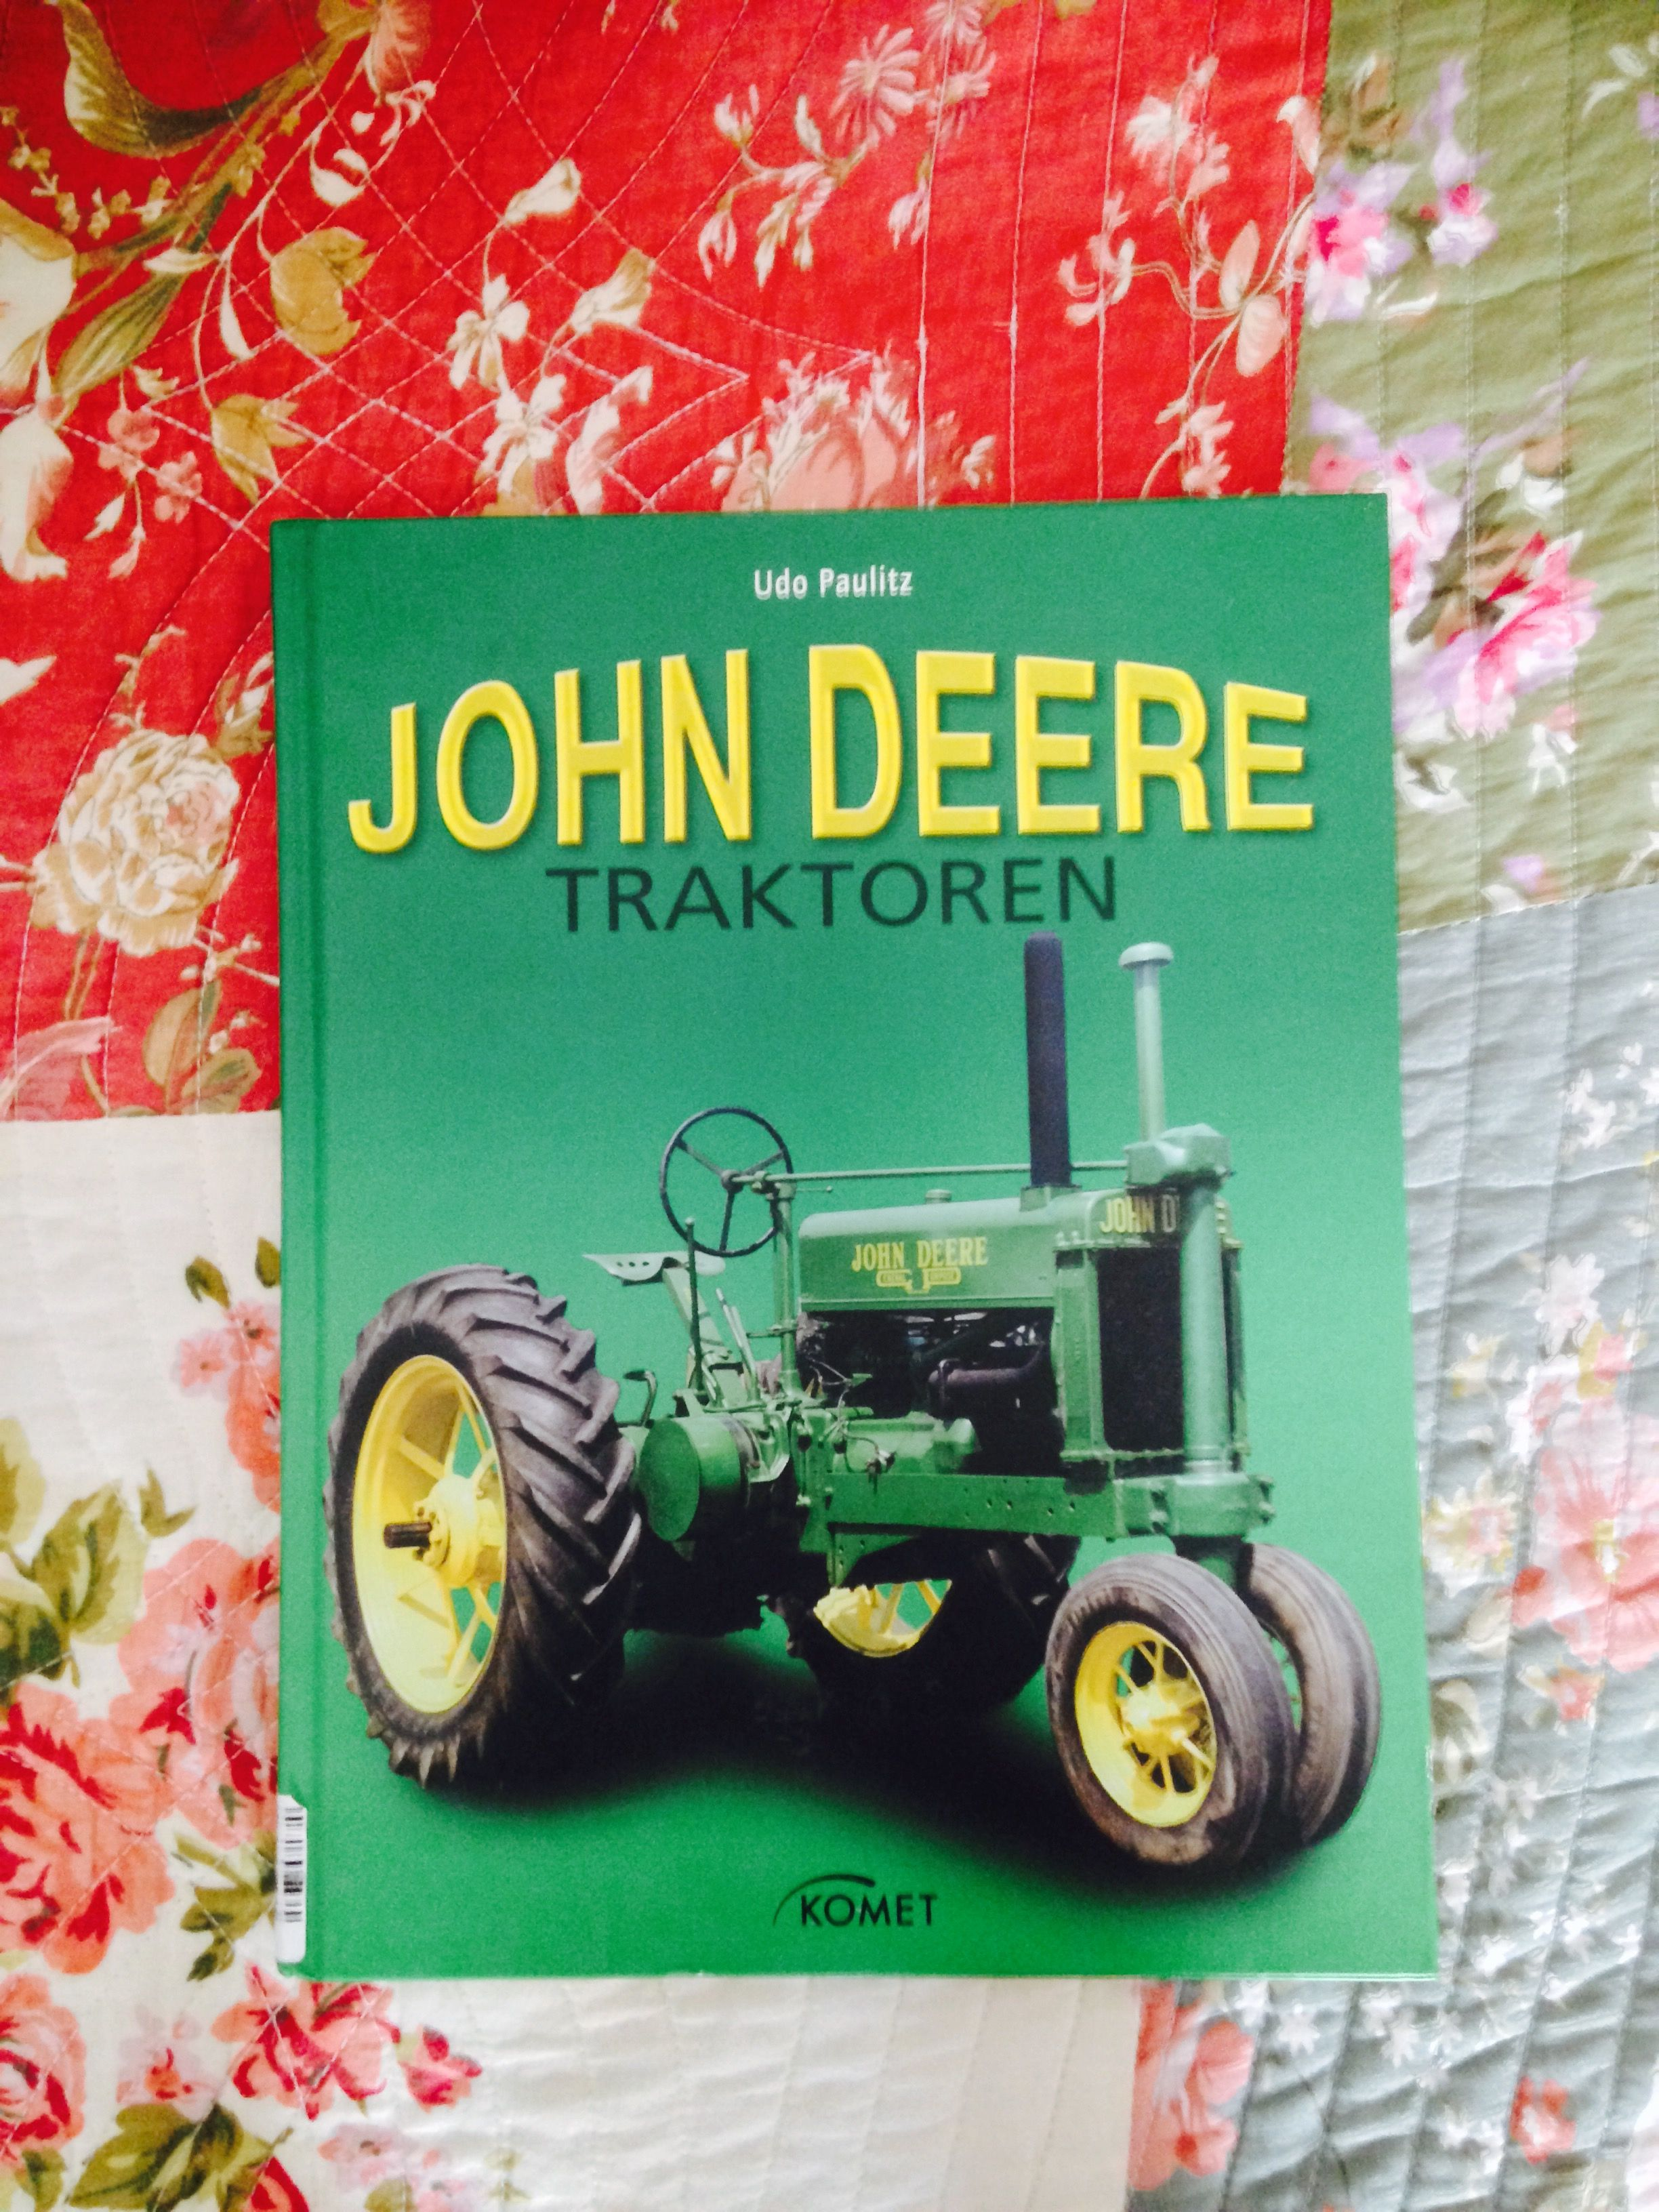 Traktoren John Deere. In meinem Bücherregal. #johndeere